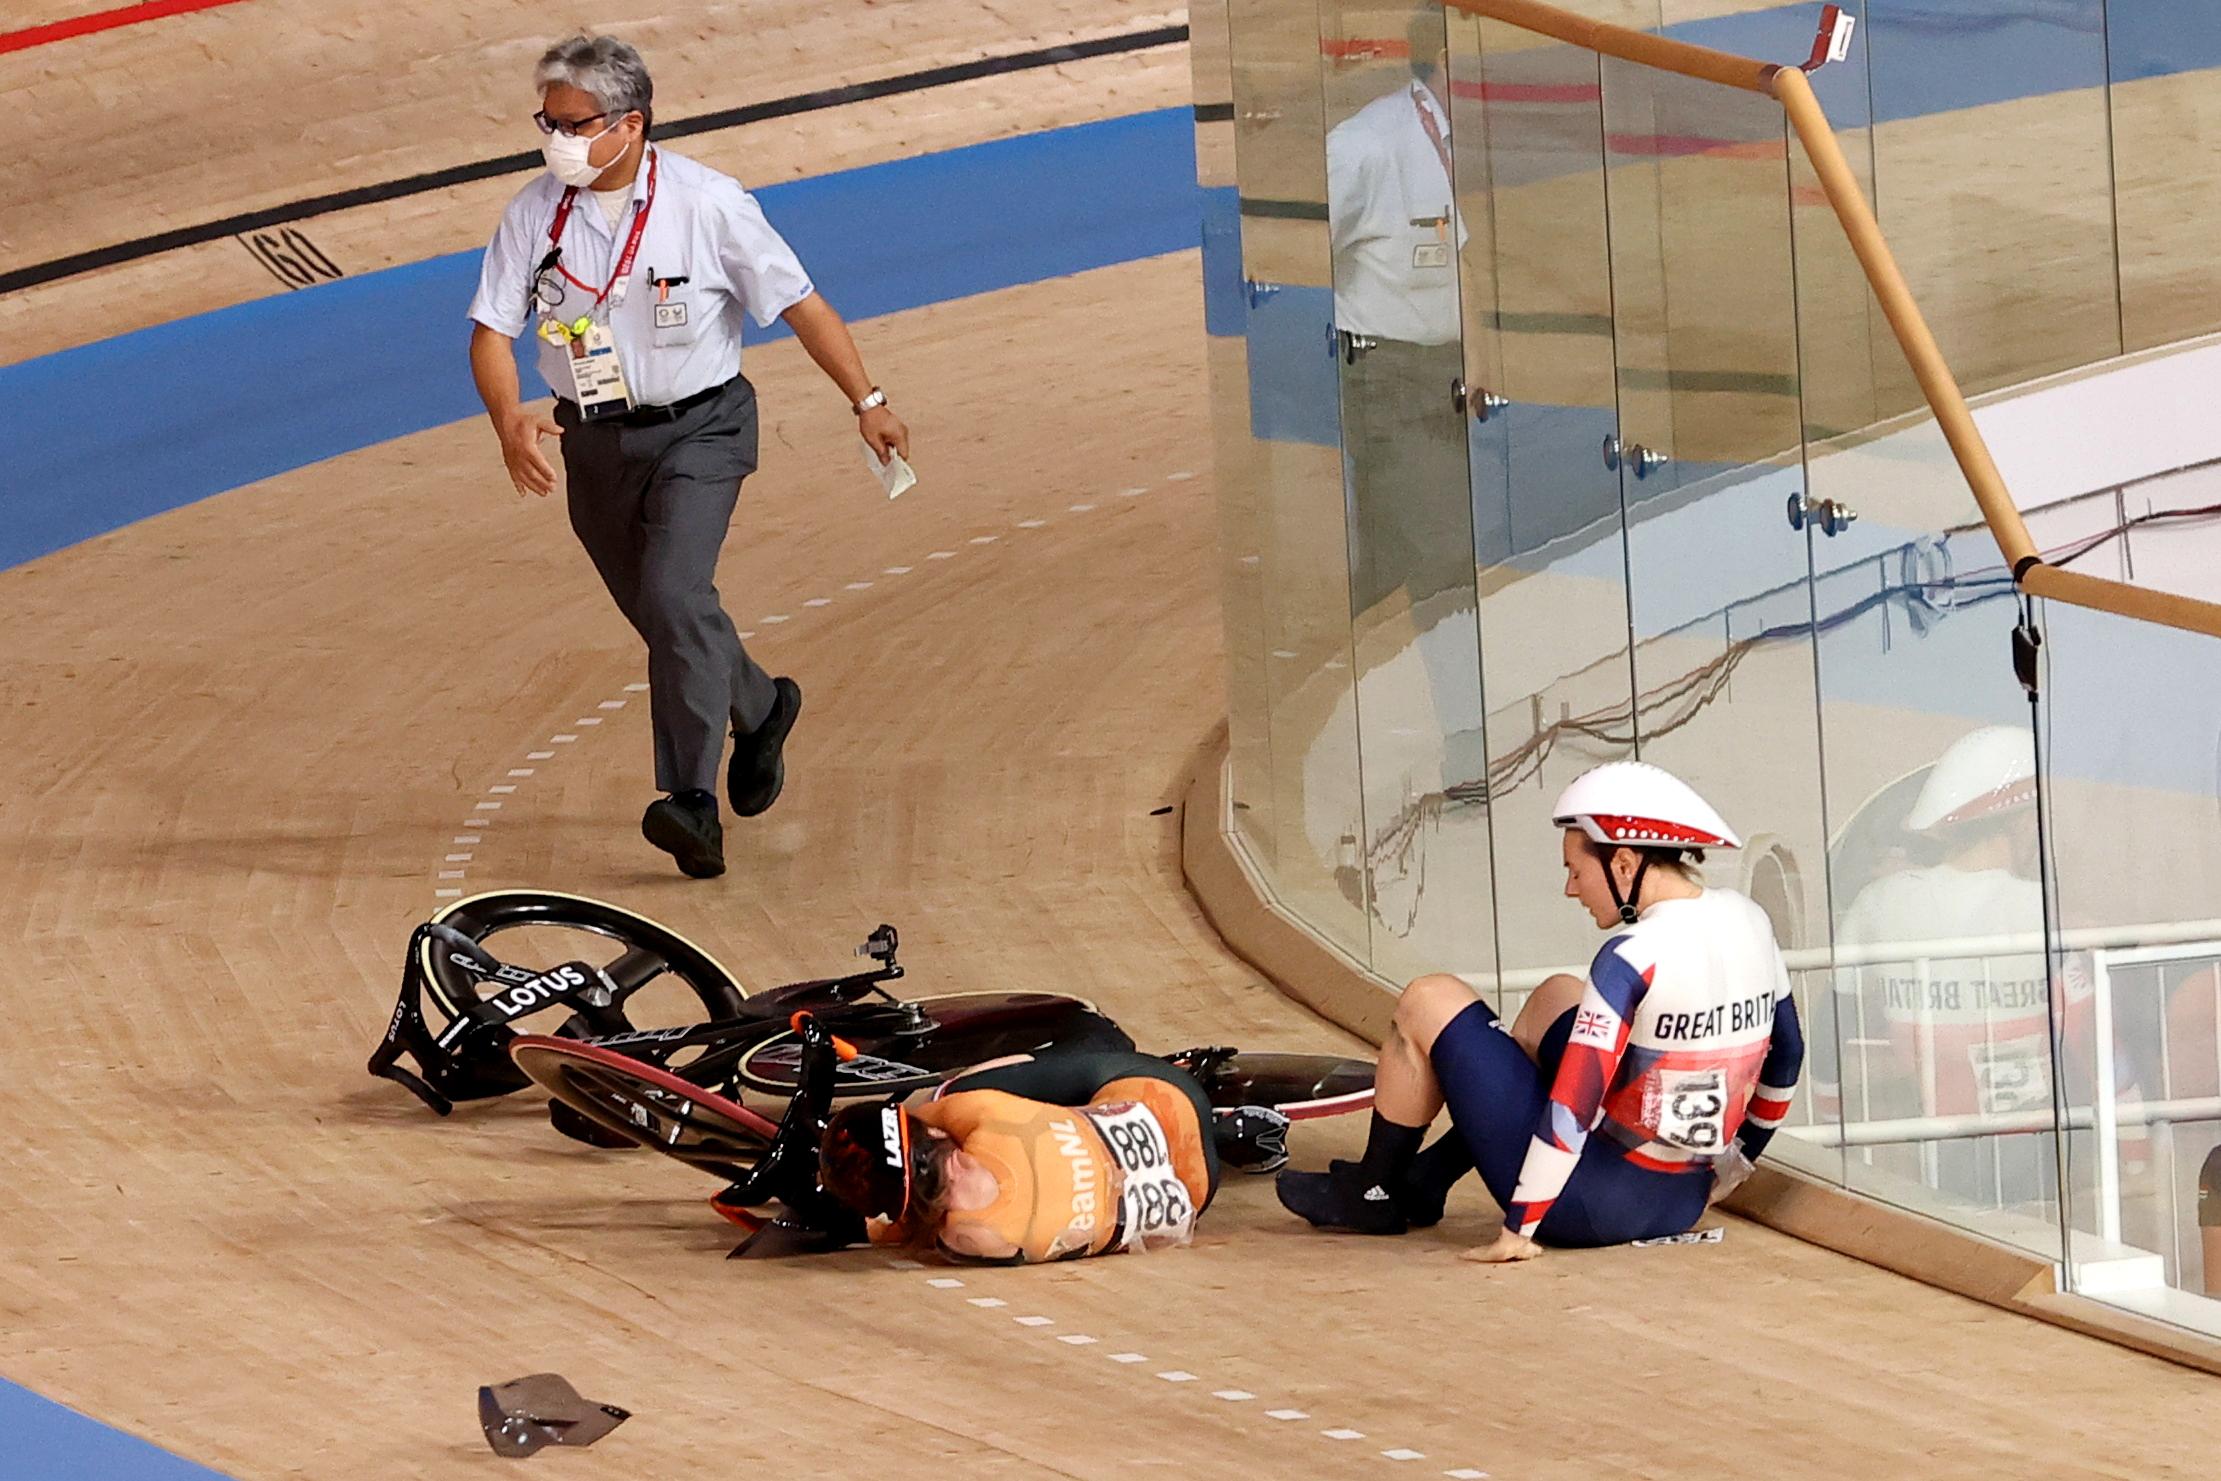 Tokyo 2020 Olympics - Cycling - Track - Women's Keirin - Quarterfinal - Izu Velodrome, Shizuoka, Japan - August 5, 2021.  Laurine van Riessen of the Netherlands and Katy Marchant of Britain crash. REUTERS/Kacper Pempel